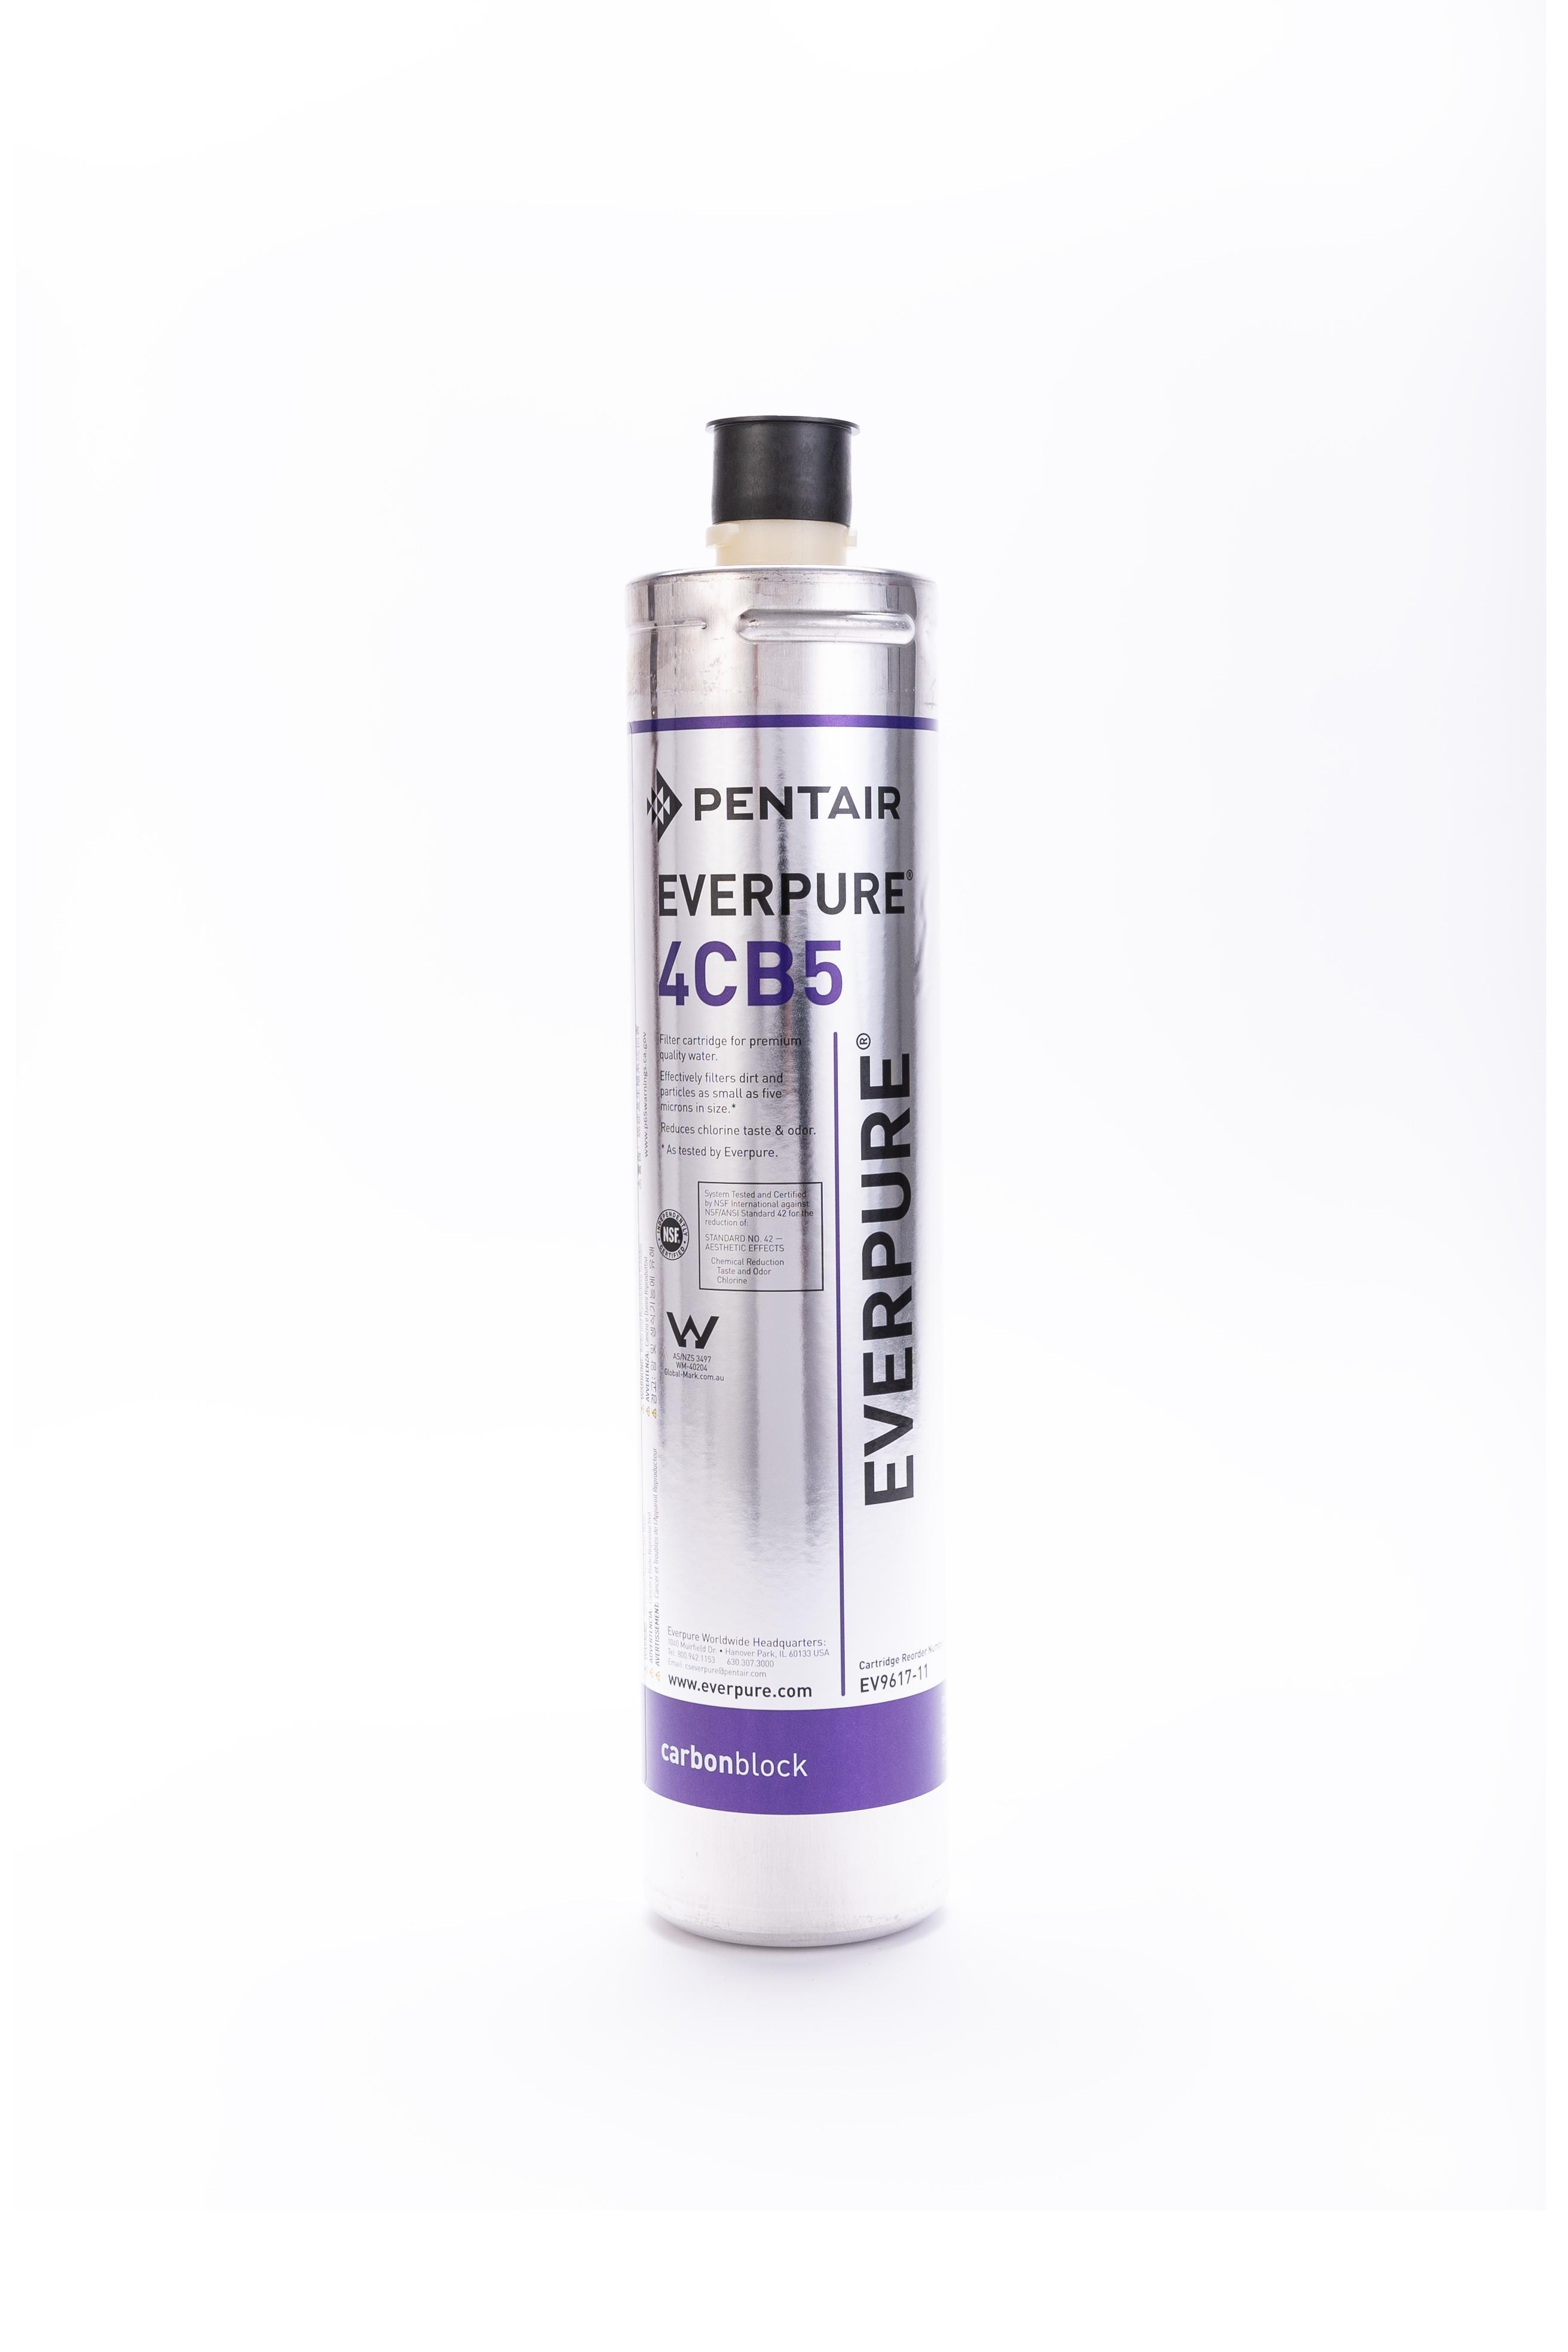 Everpure Wasserfilter  4CB5